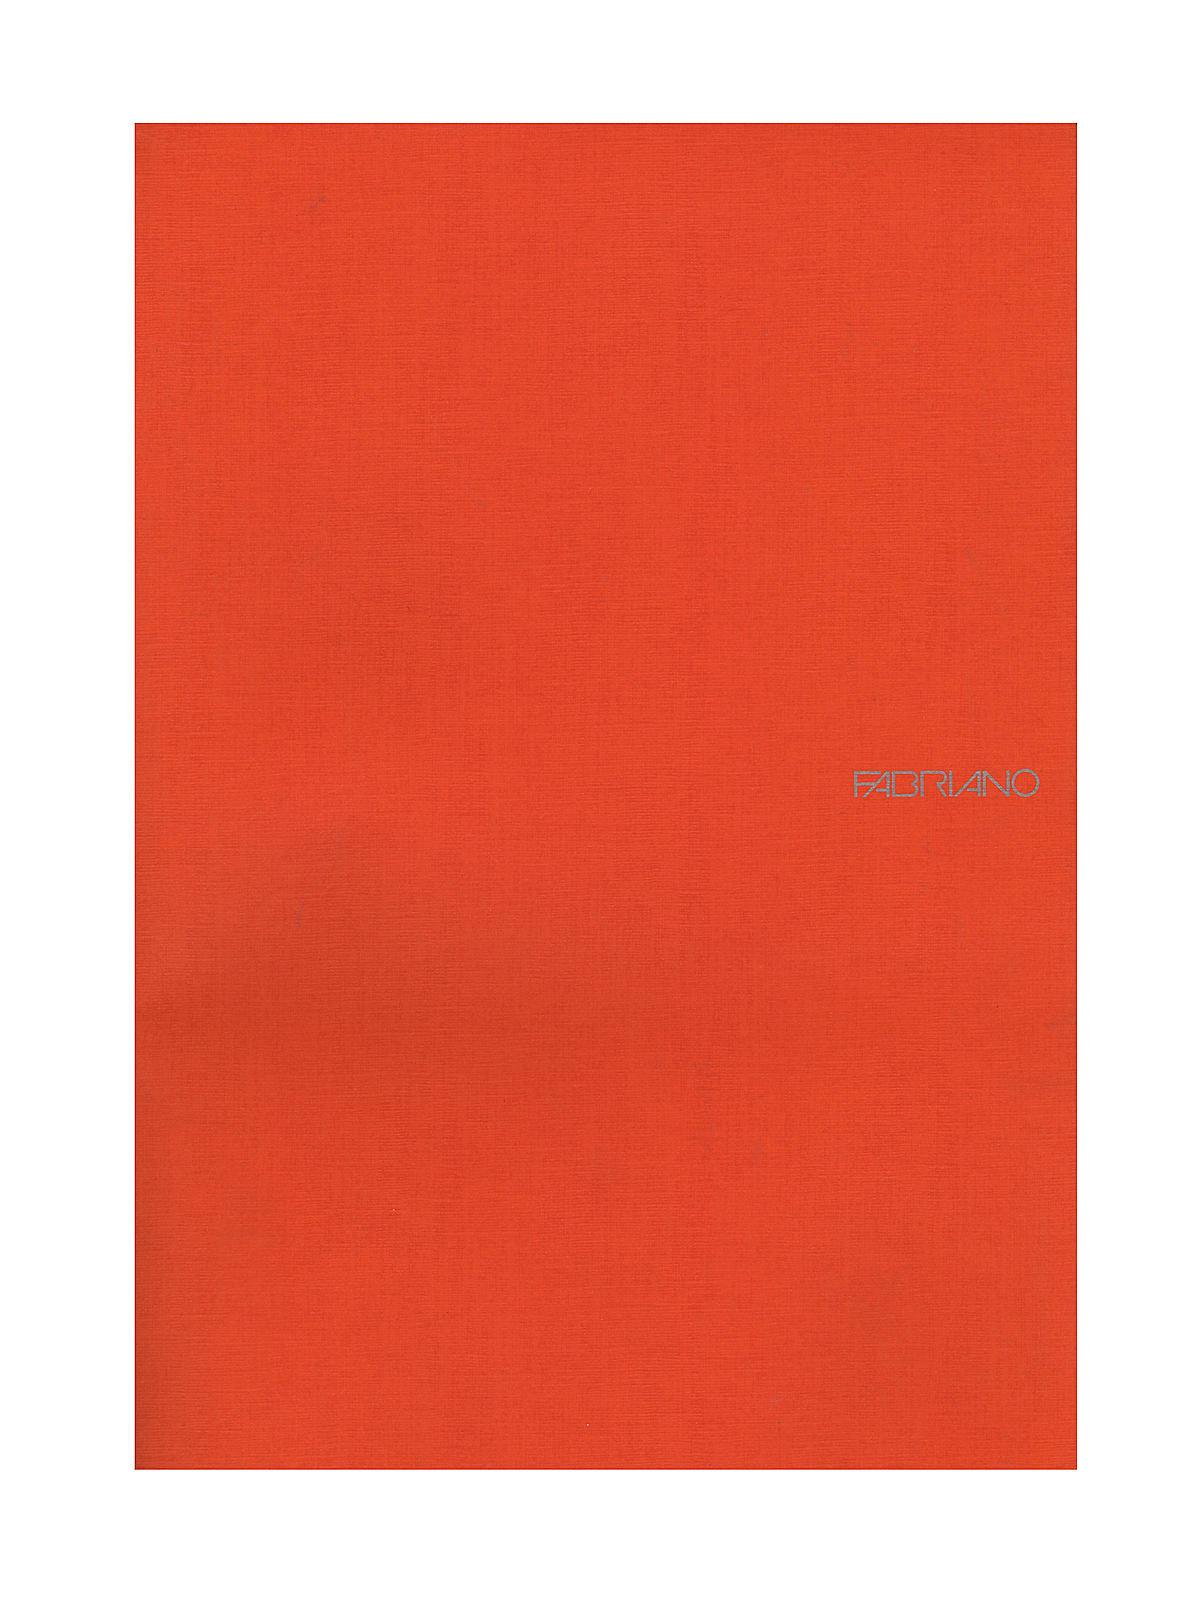 Fabriano EcoQua Notebooks staplebound blank black 8.25 x 11.7 in.